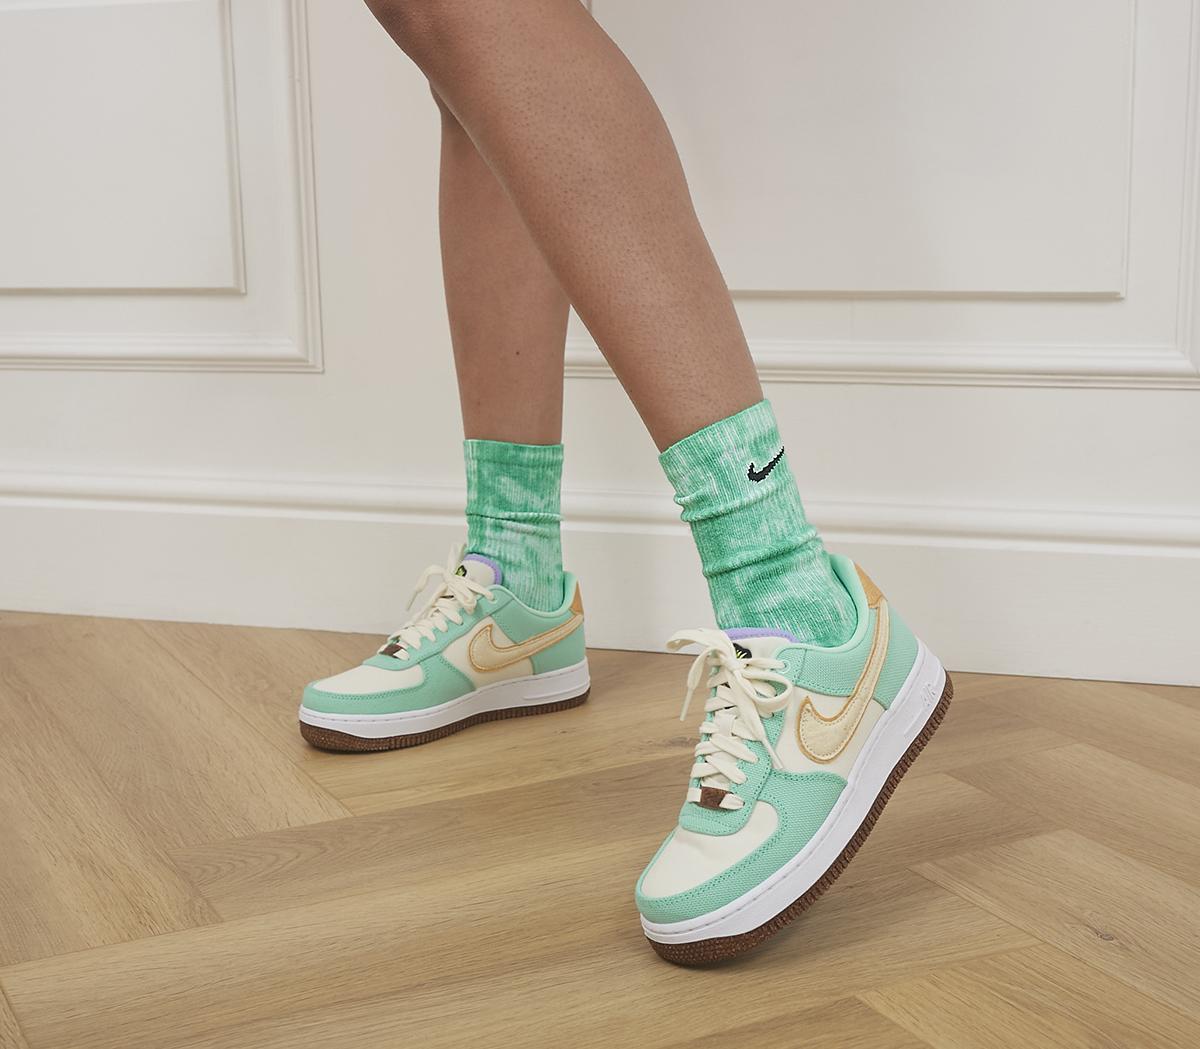 Everyday Plush Crew Tie-Dye Socks 2 Pack